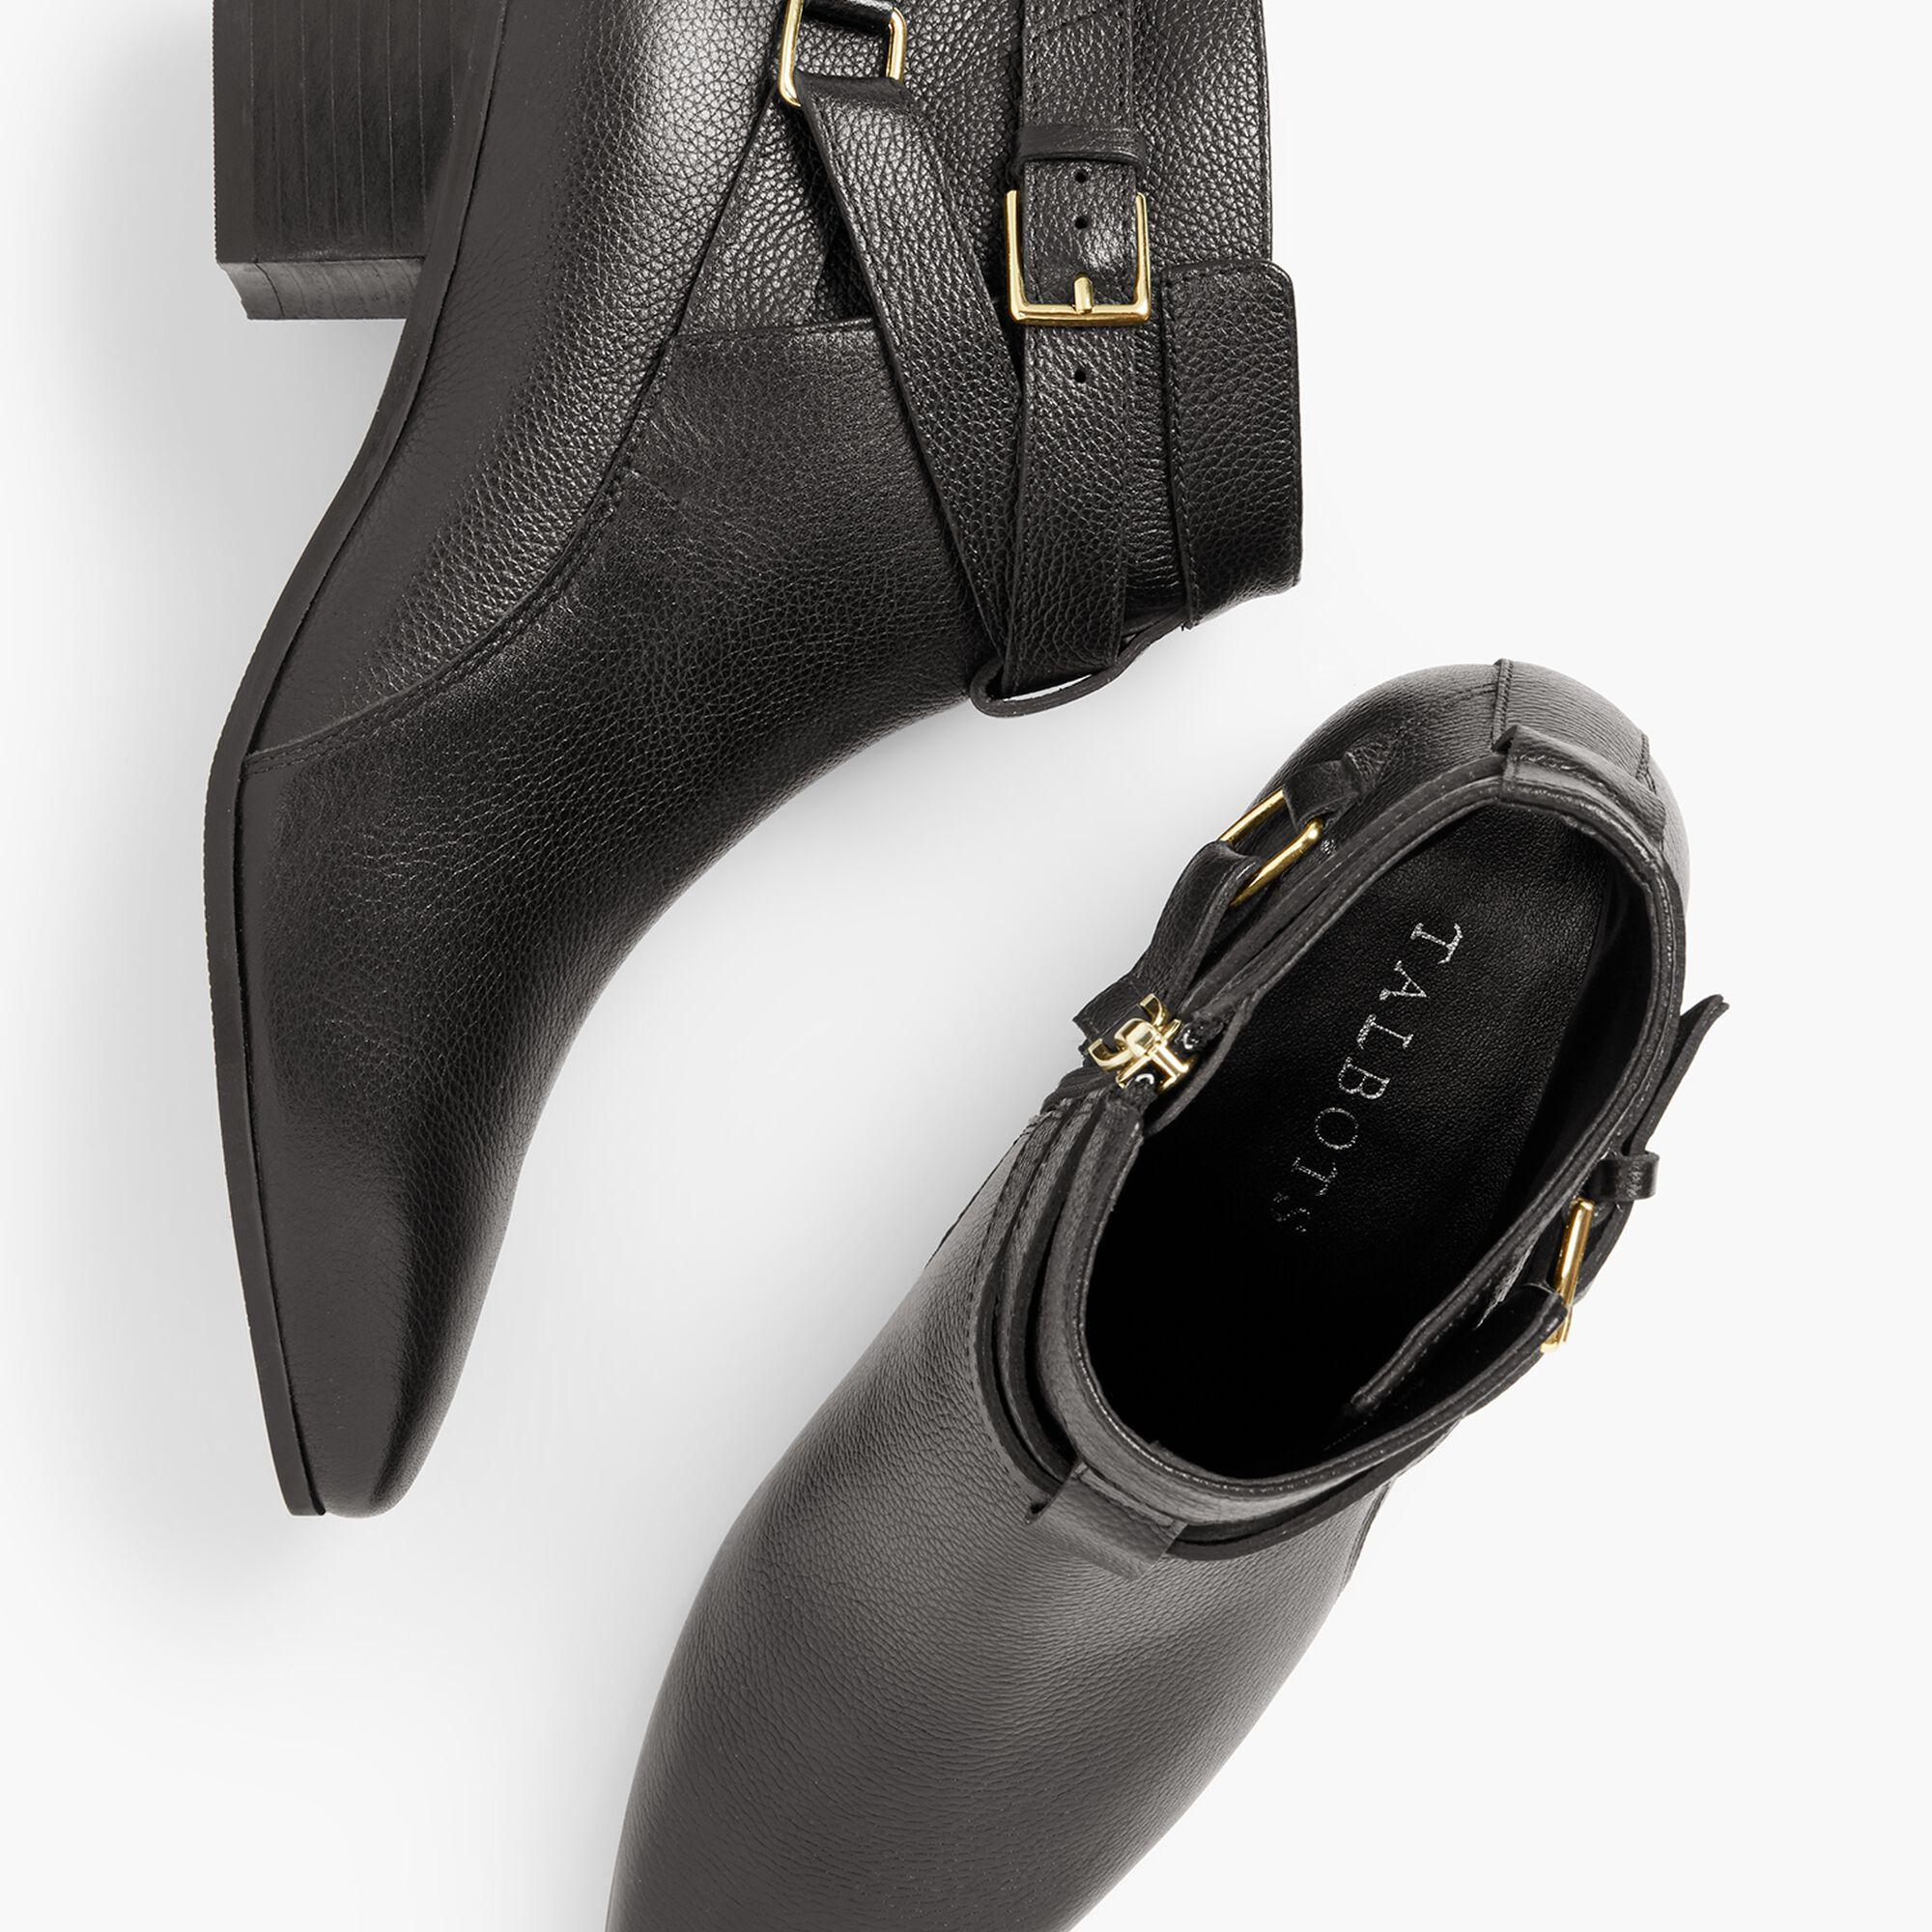 009b785b5f1d Images. Dakota Block Heel Ankle Boots - Pebble Leather